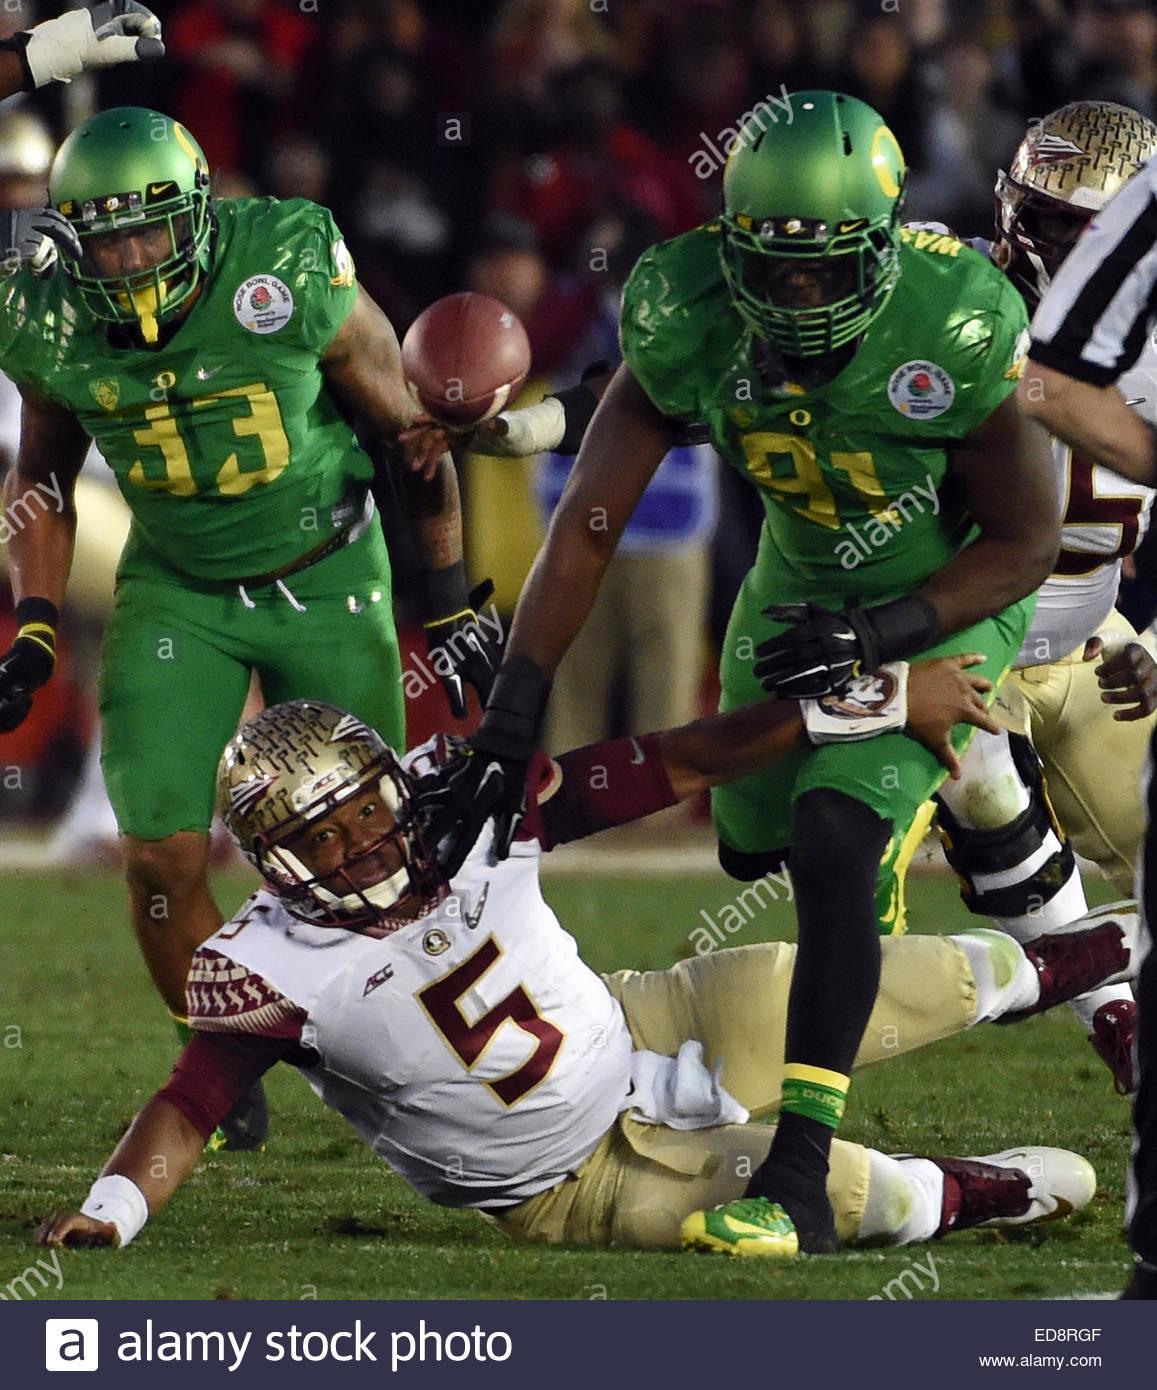 Pasadena, California, USA. 01st Jan, 2015. Florida State Seminoles quarterback Jameis Winston (5) fumbles as Oregon - Stock Image